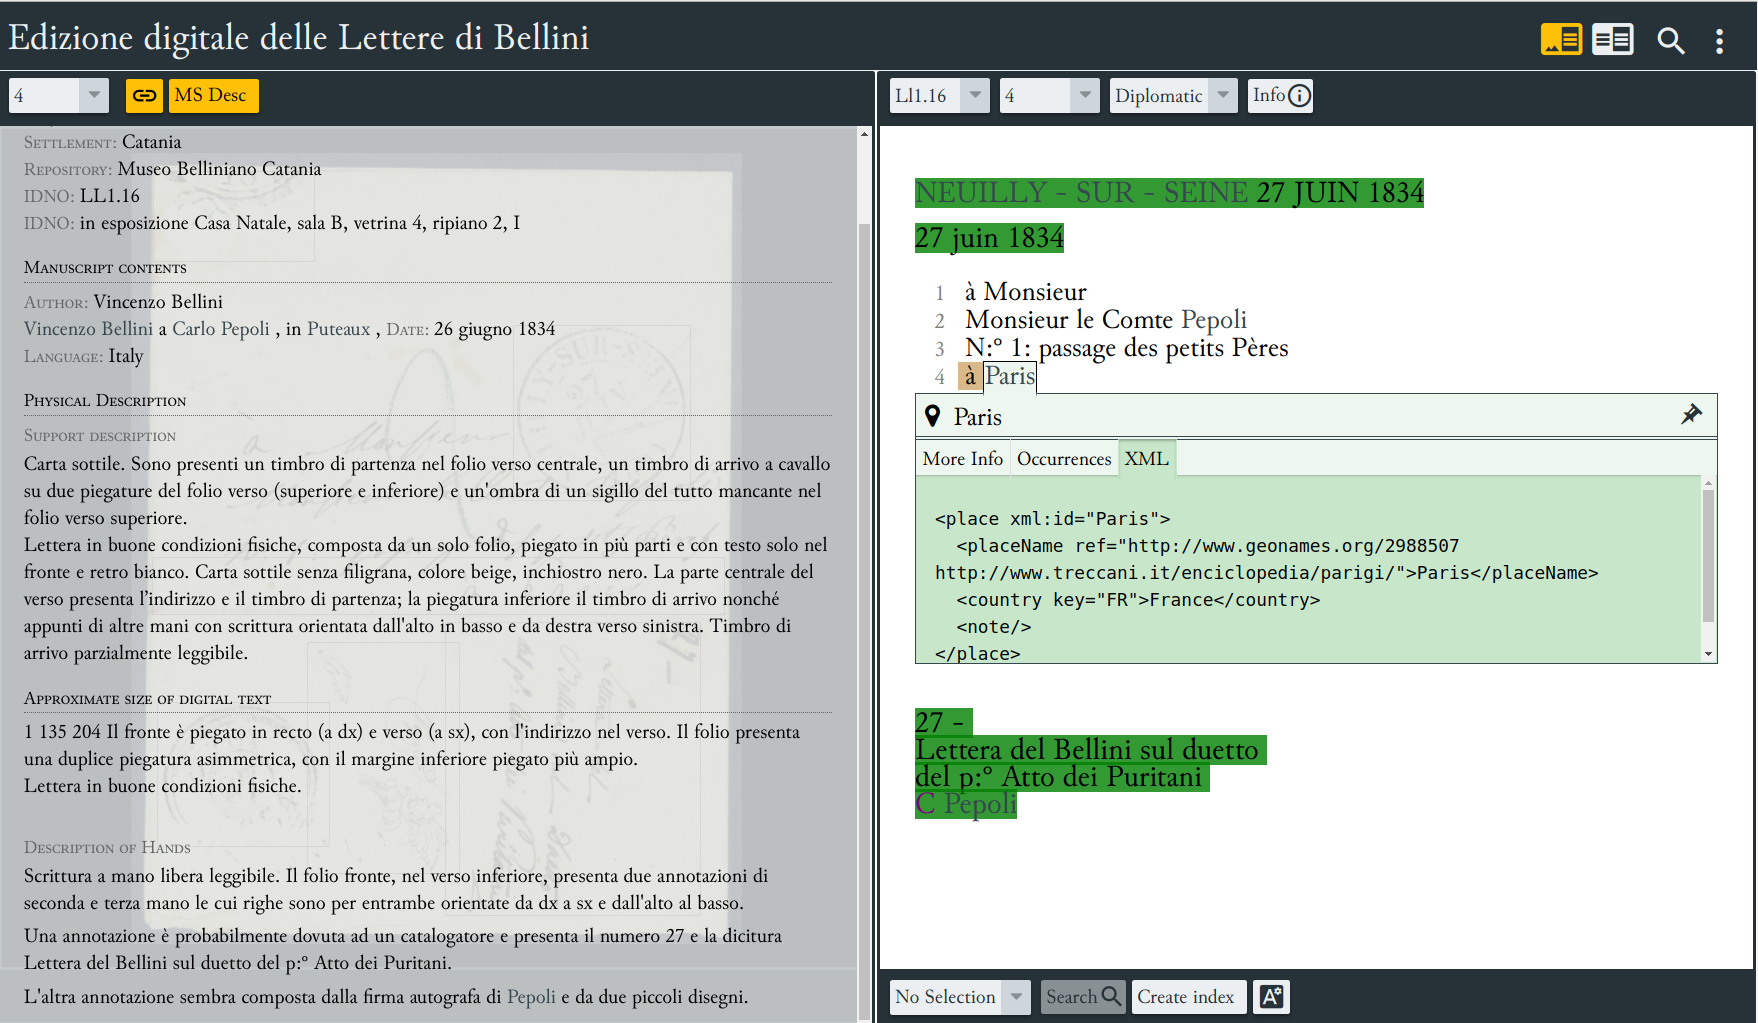 Manuscript description (left hand box) and the envelope information (right hand box).